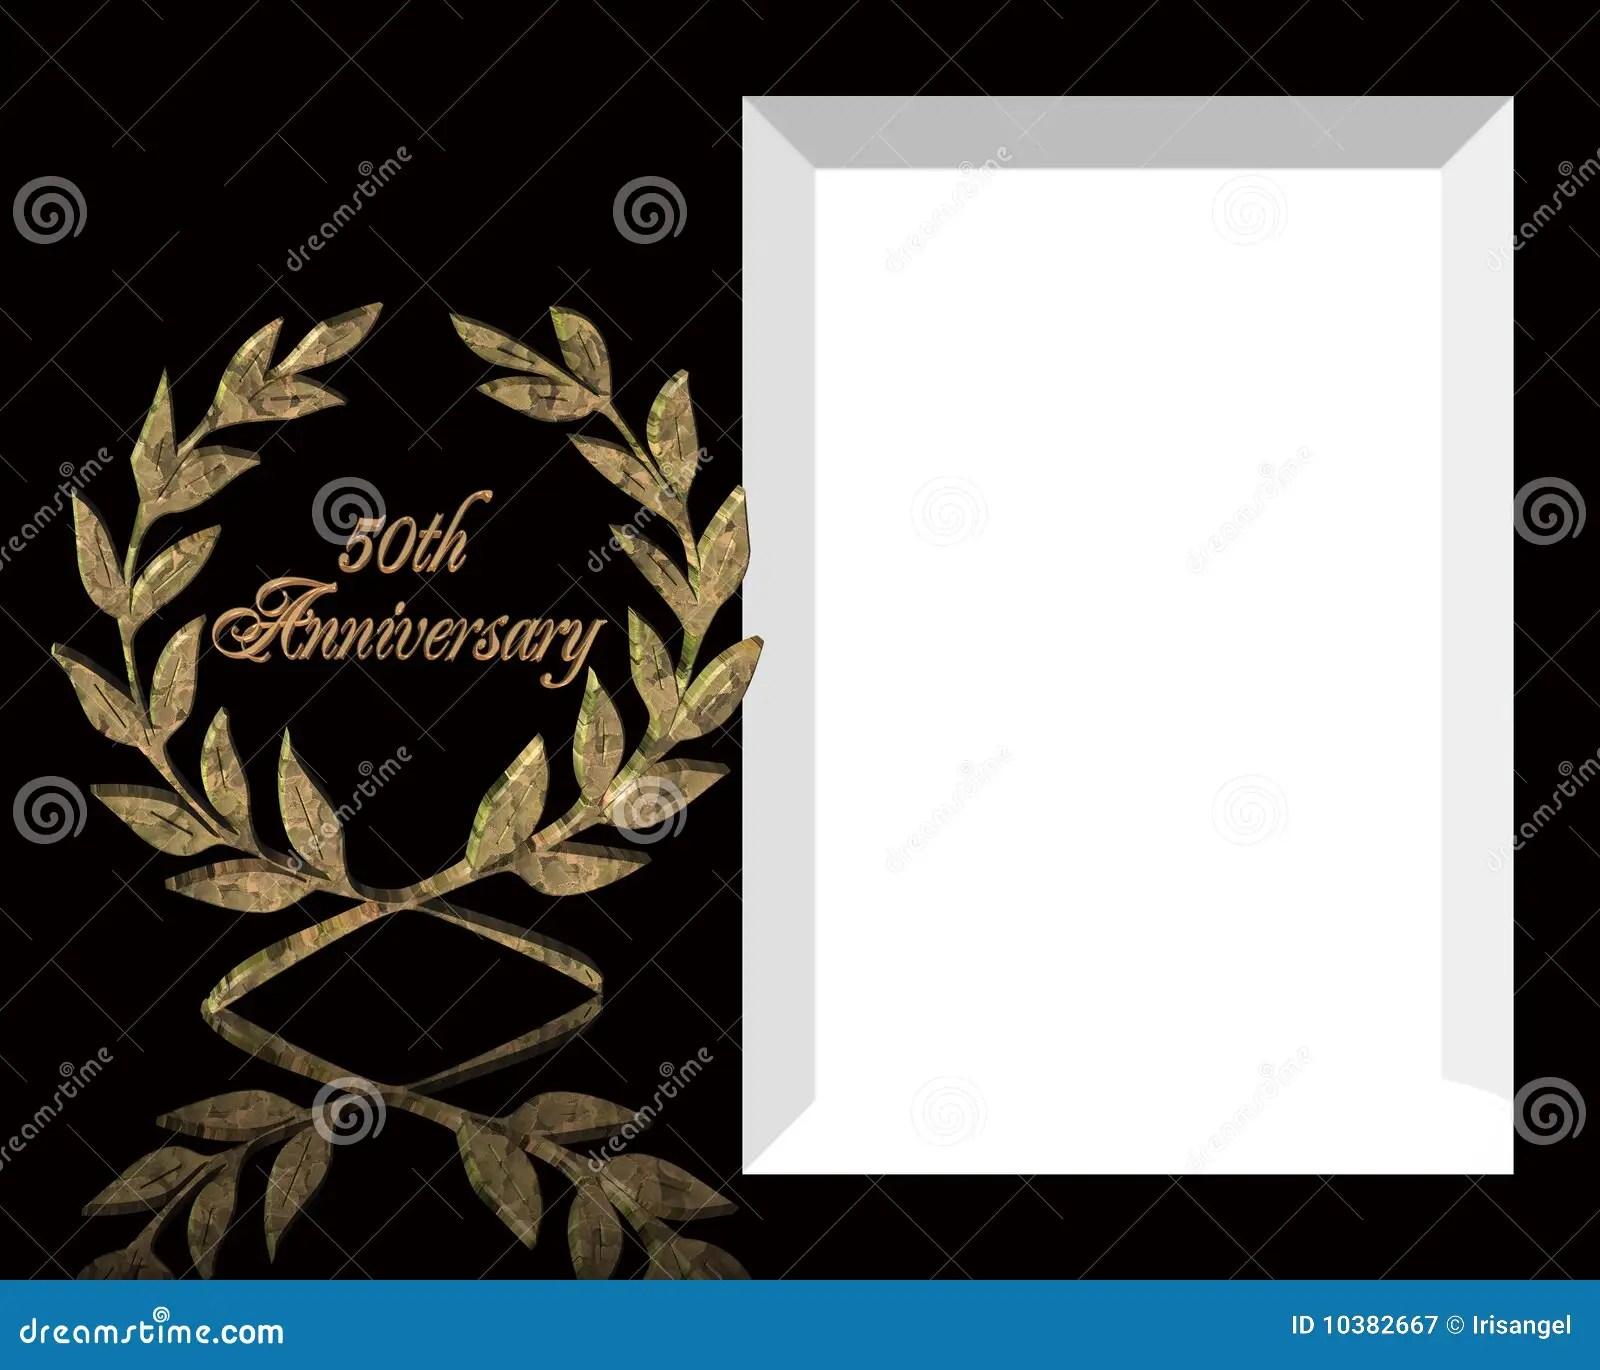 Wedding Anniversary Template anniversary invitation template card – 50th Wedding Anniversary Invitation Templates